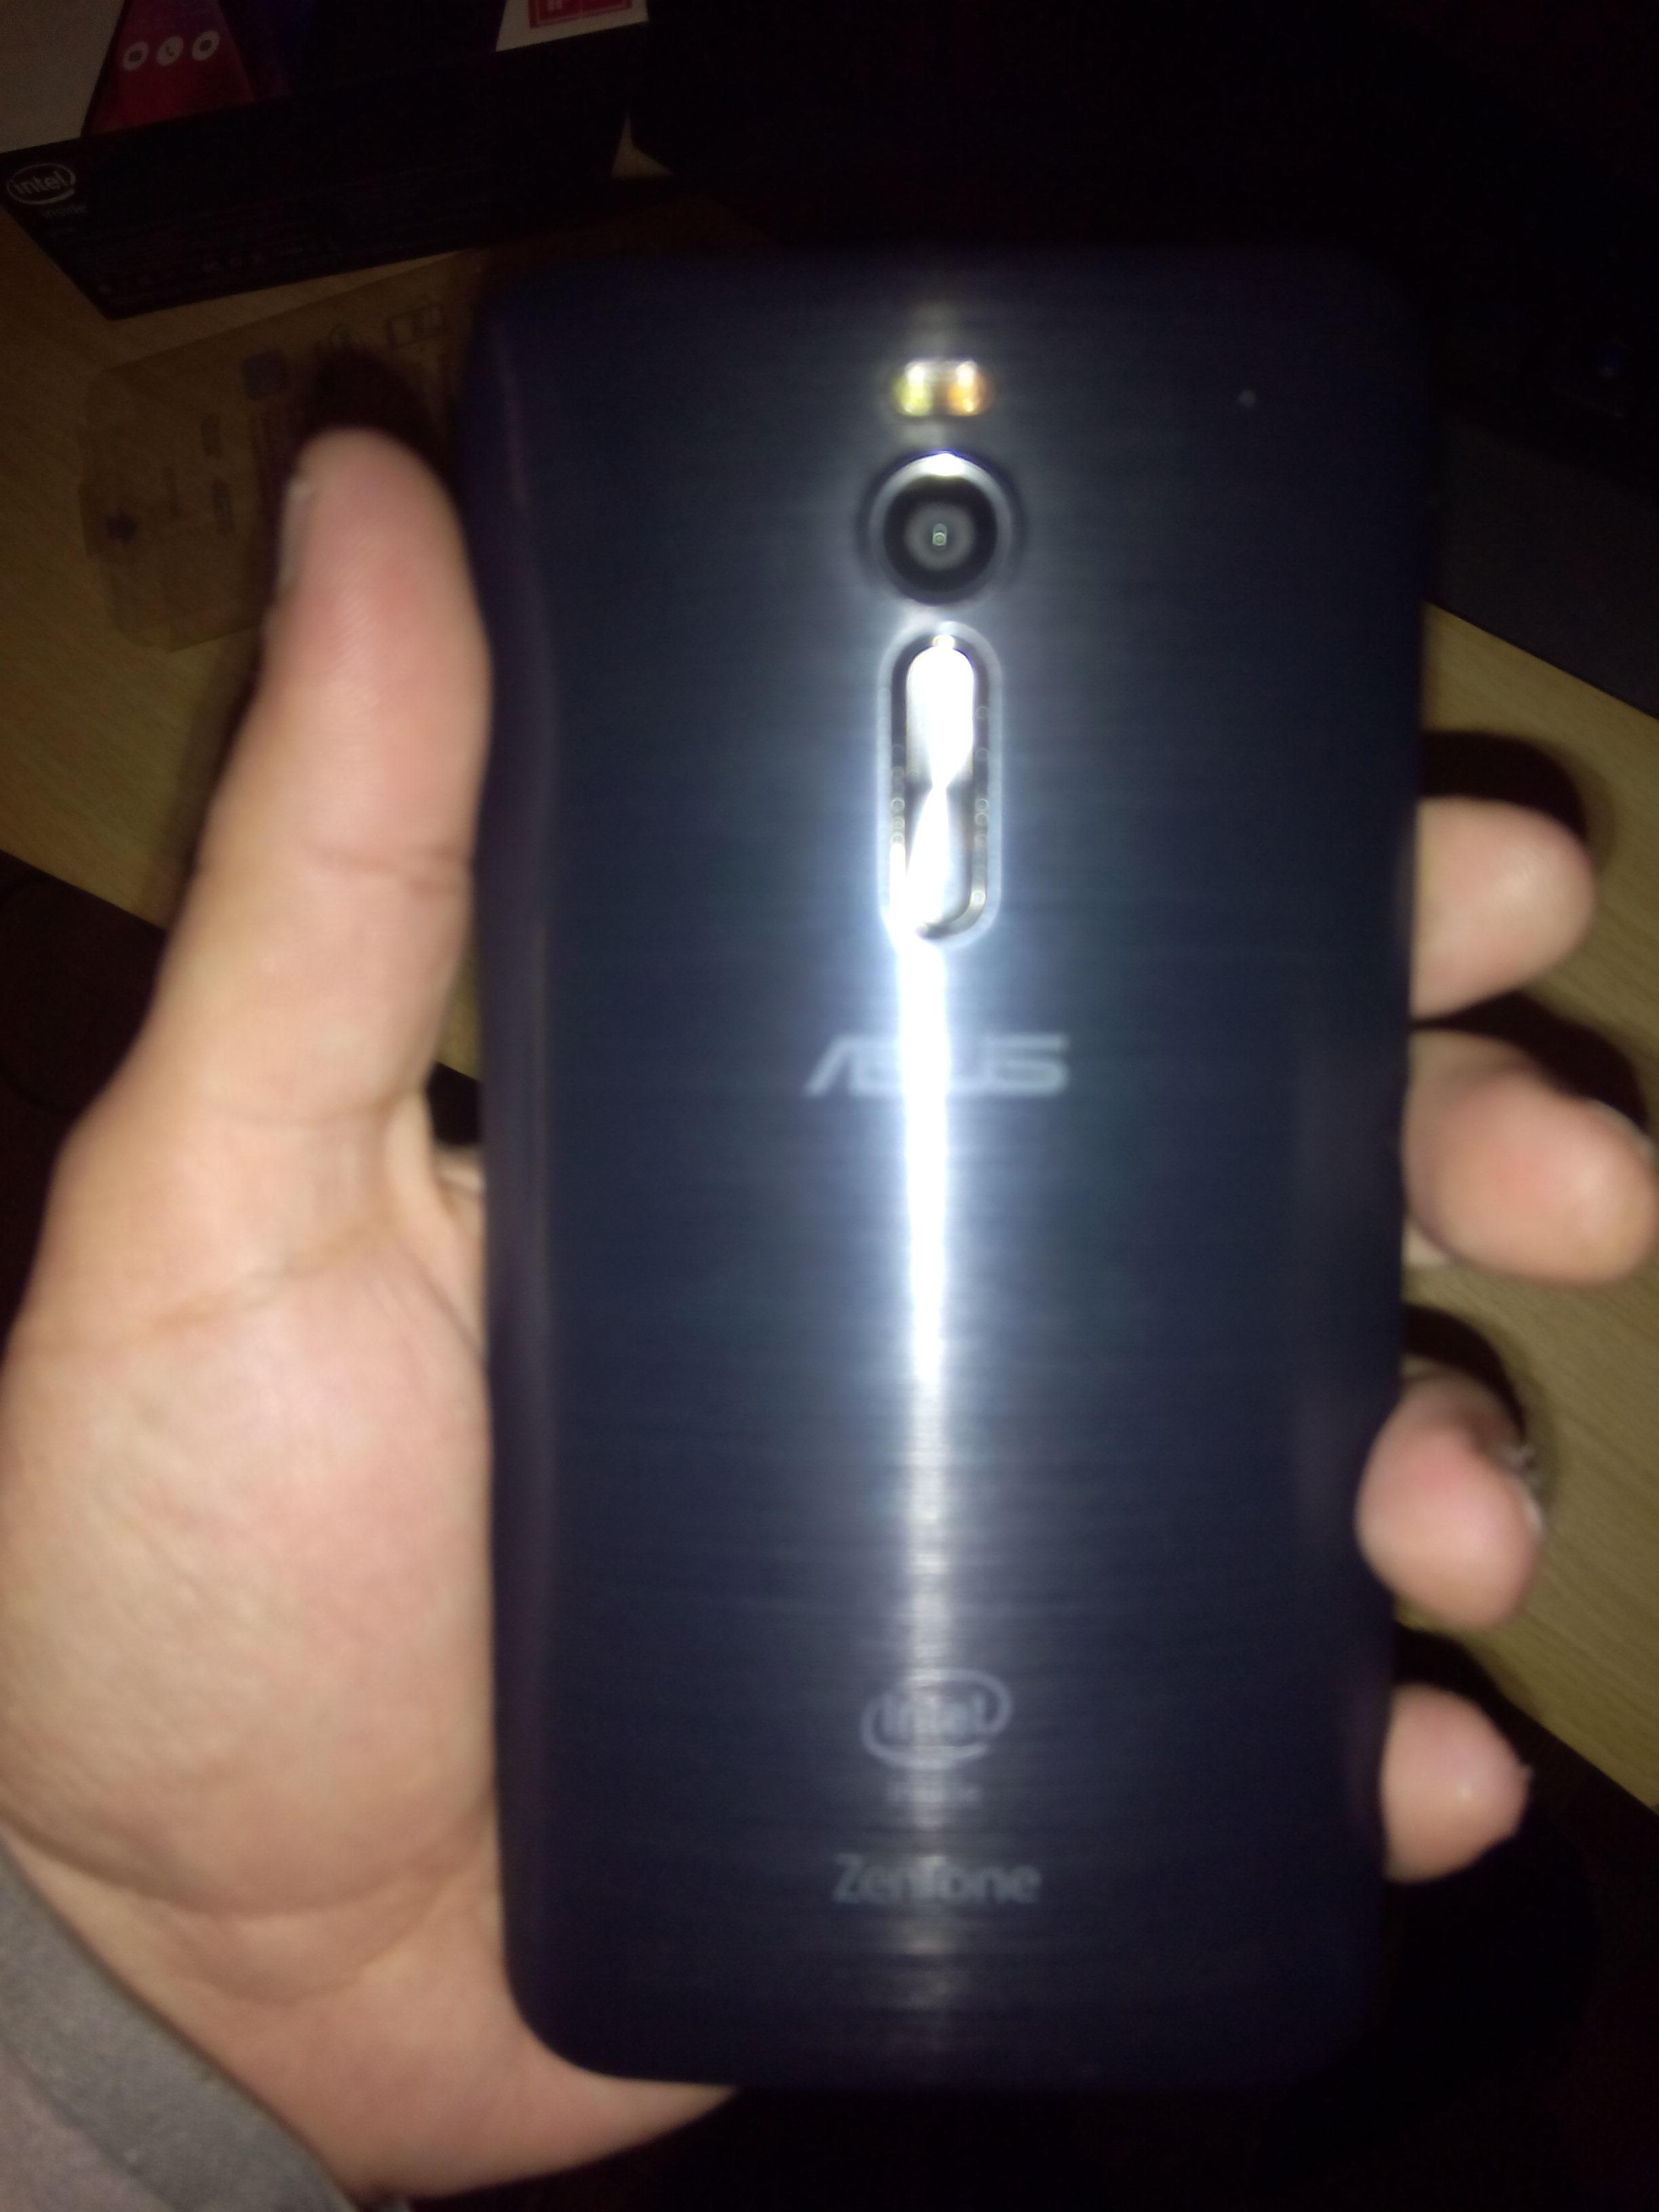 Zenfone 2 back cover